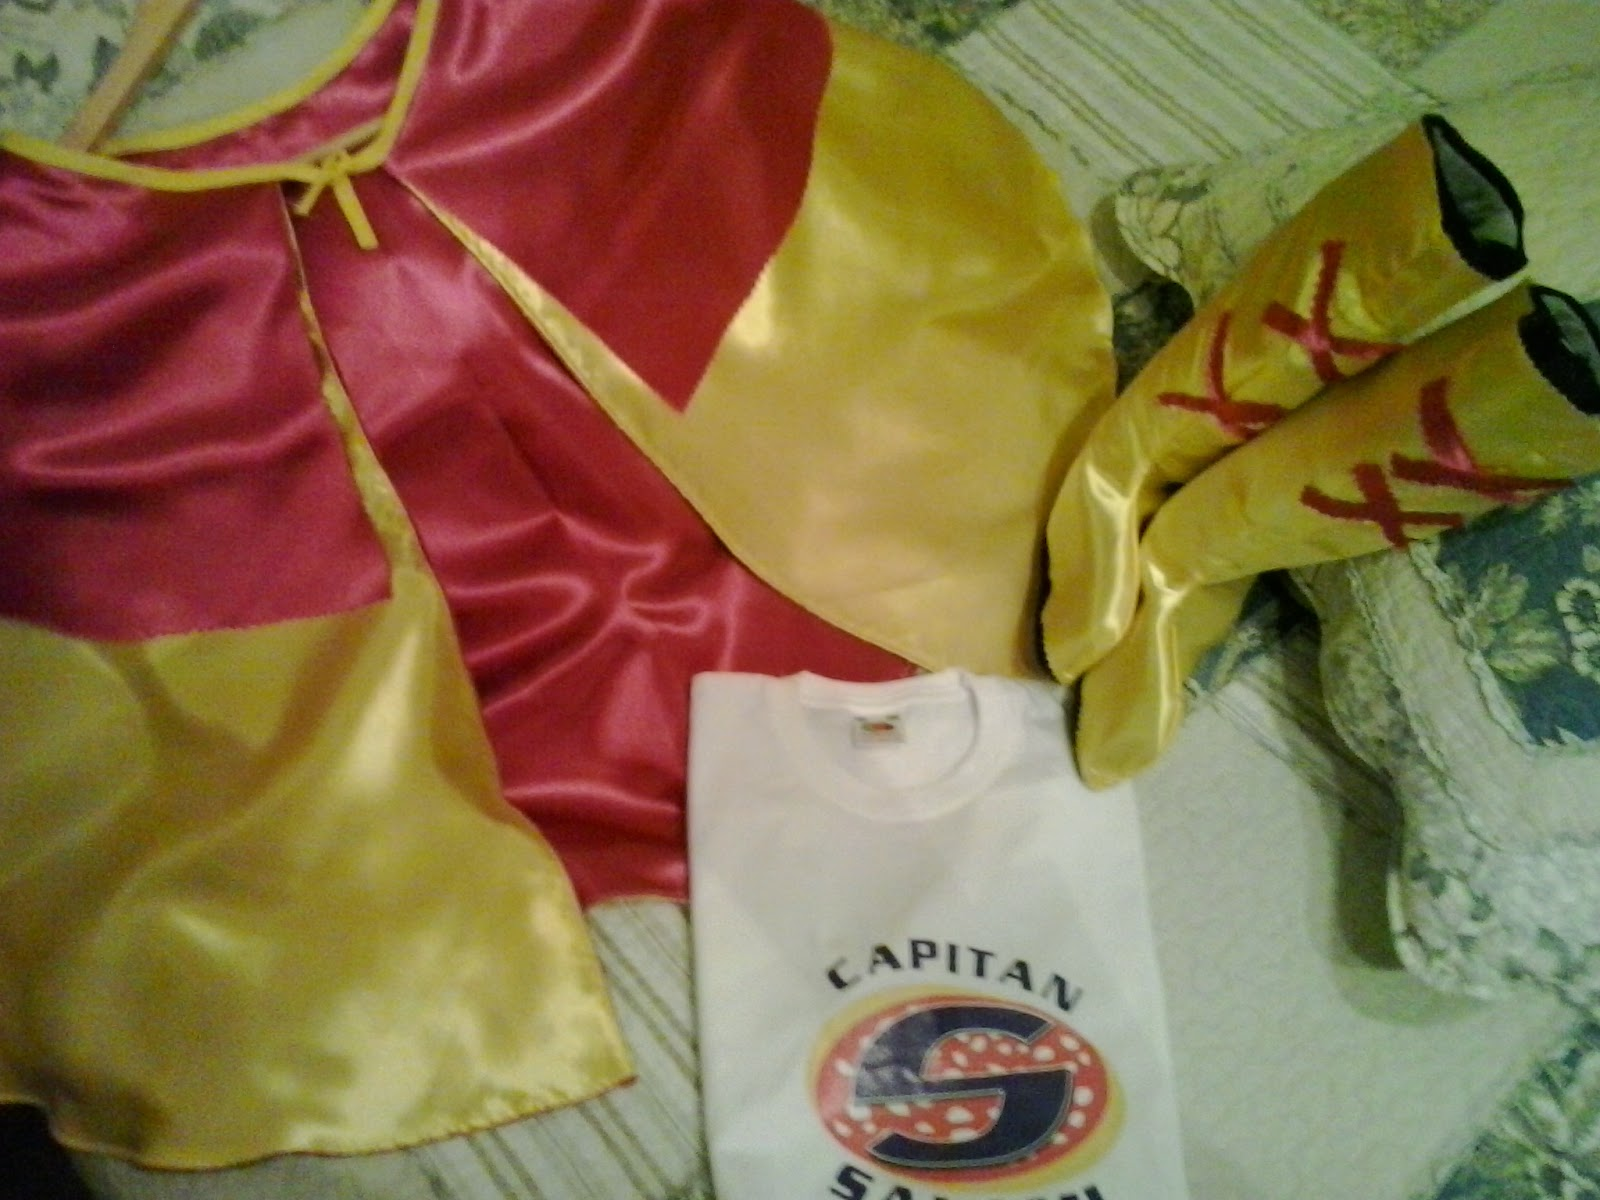 capa, botas y camiseta de capitan salami